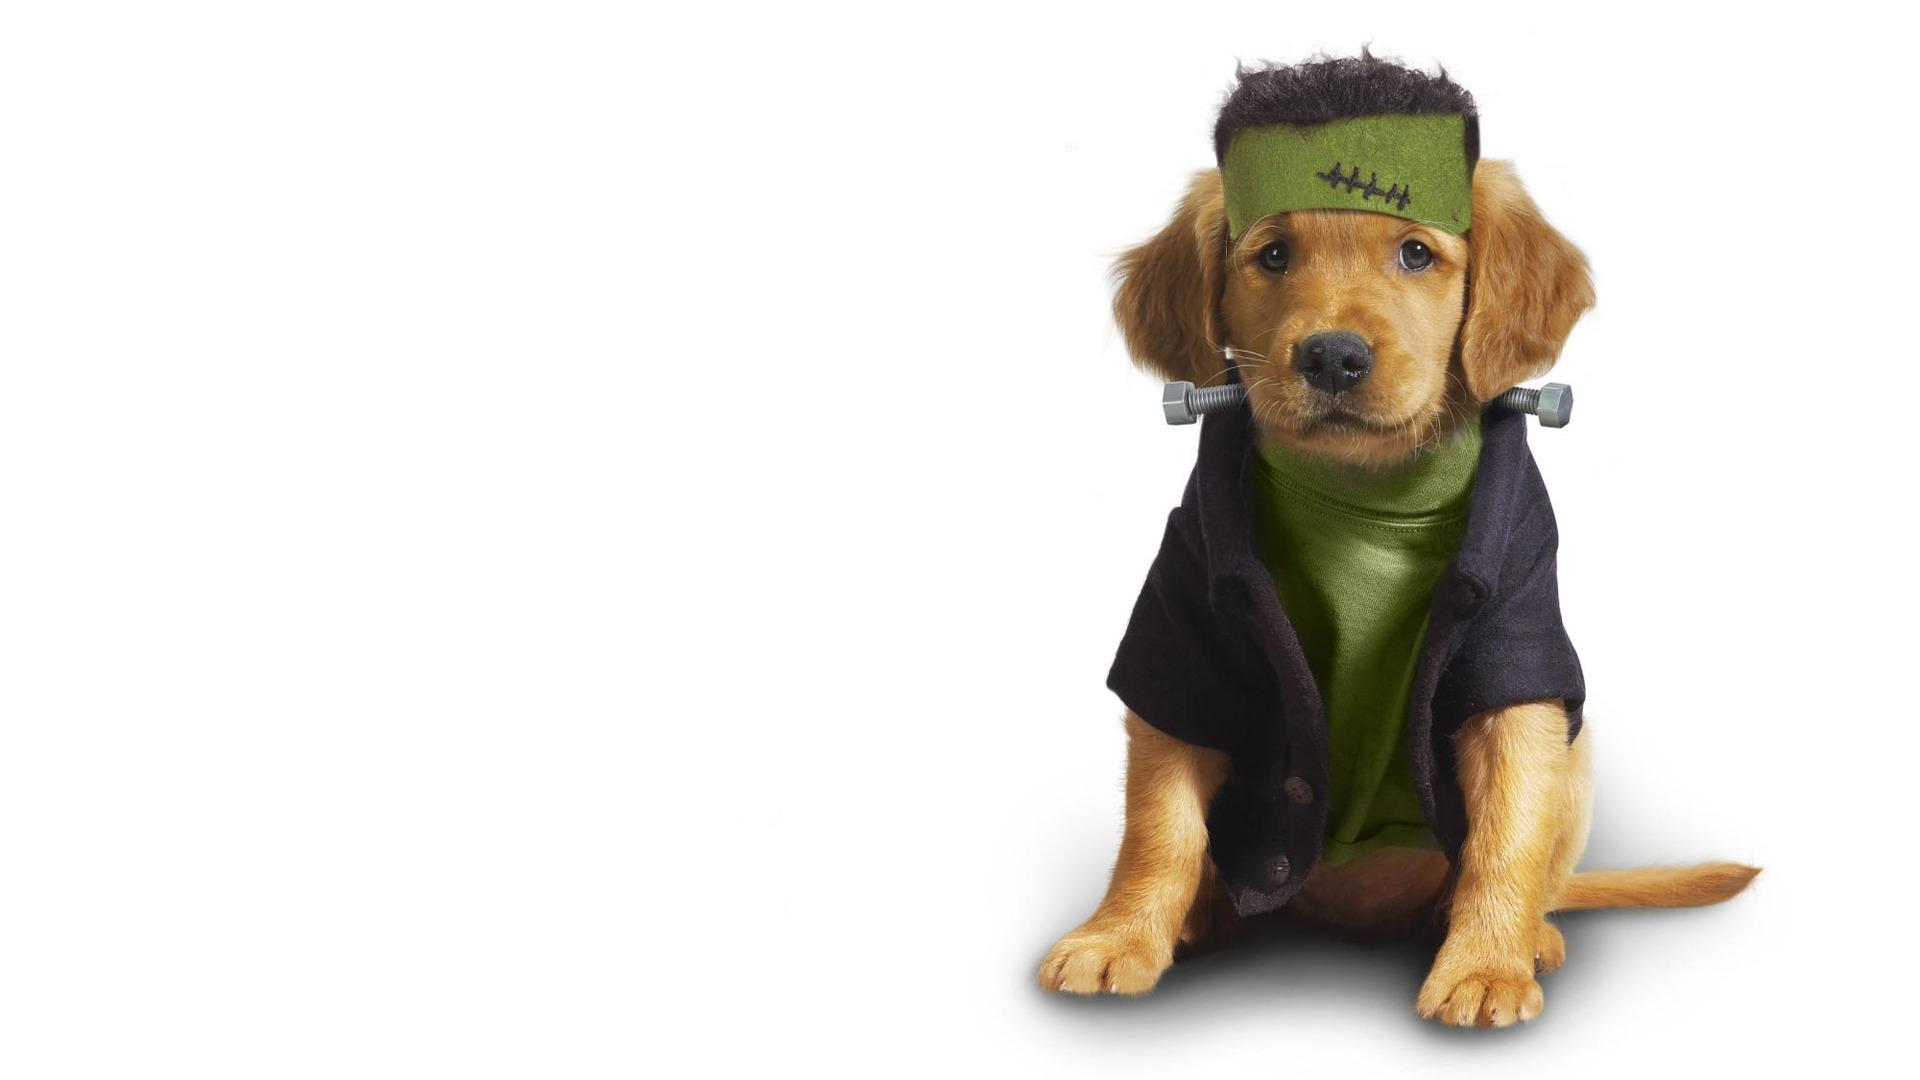 子犬写真のHD壁紙(10) #6 - 1920x1080 壁紙ダウンロード - 子犬写真のHD壁紙(10) - 動物 ... Hd Wallpaper 1920x1080